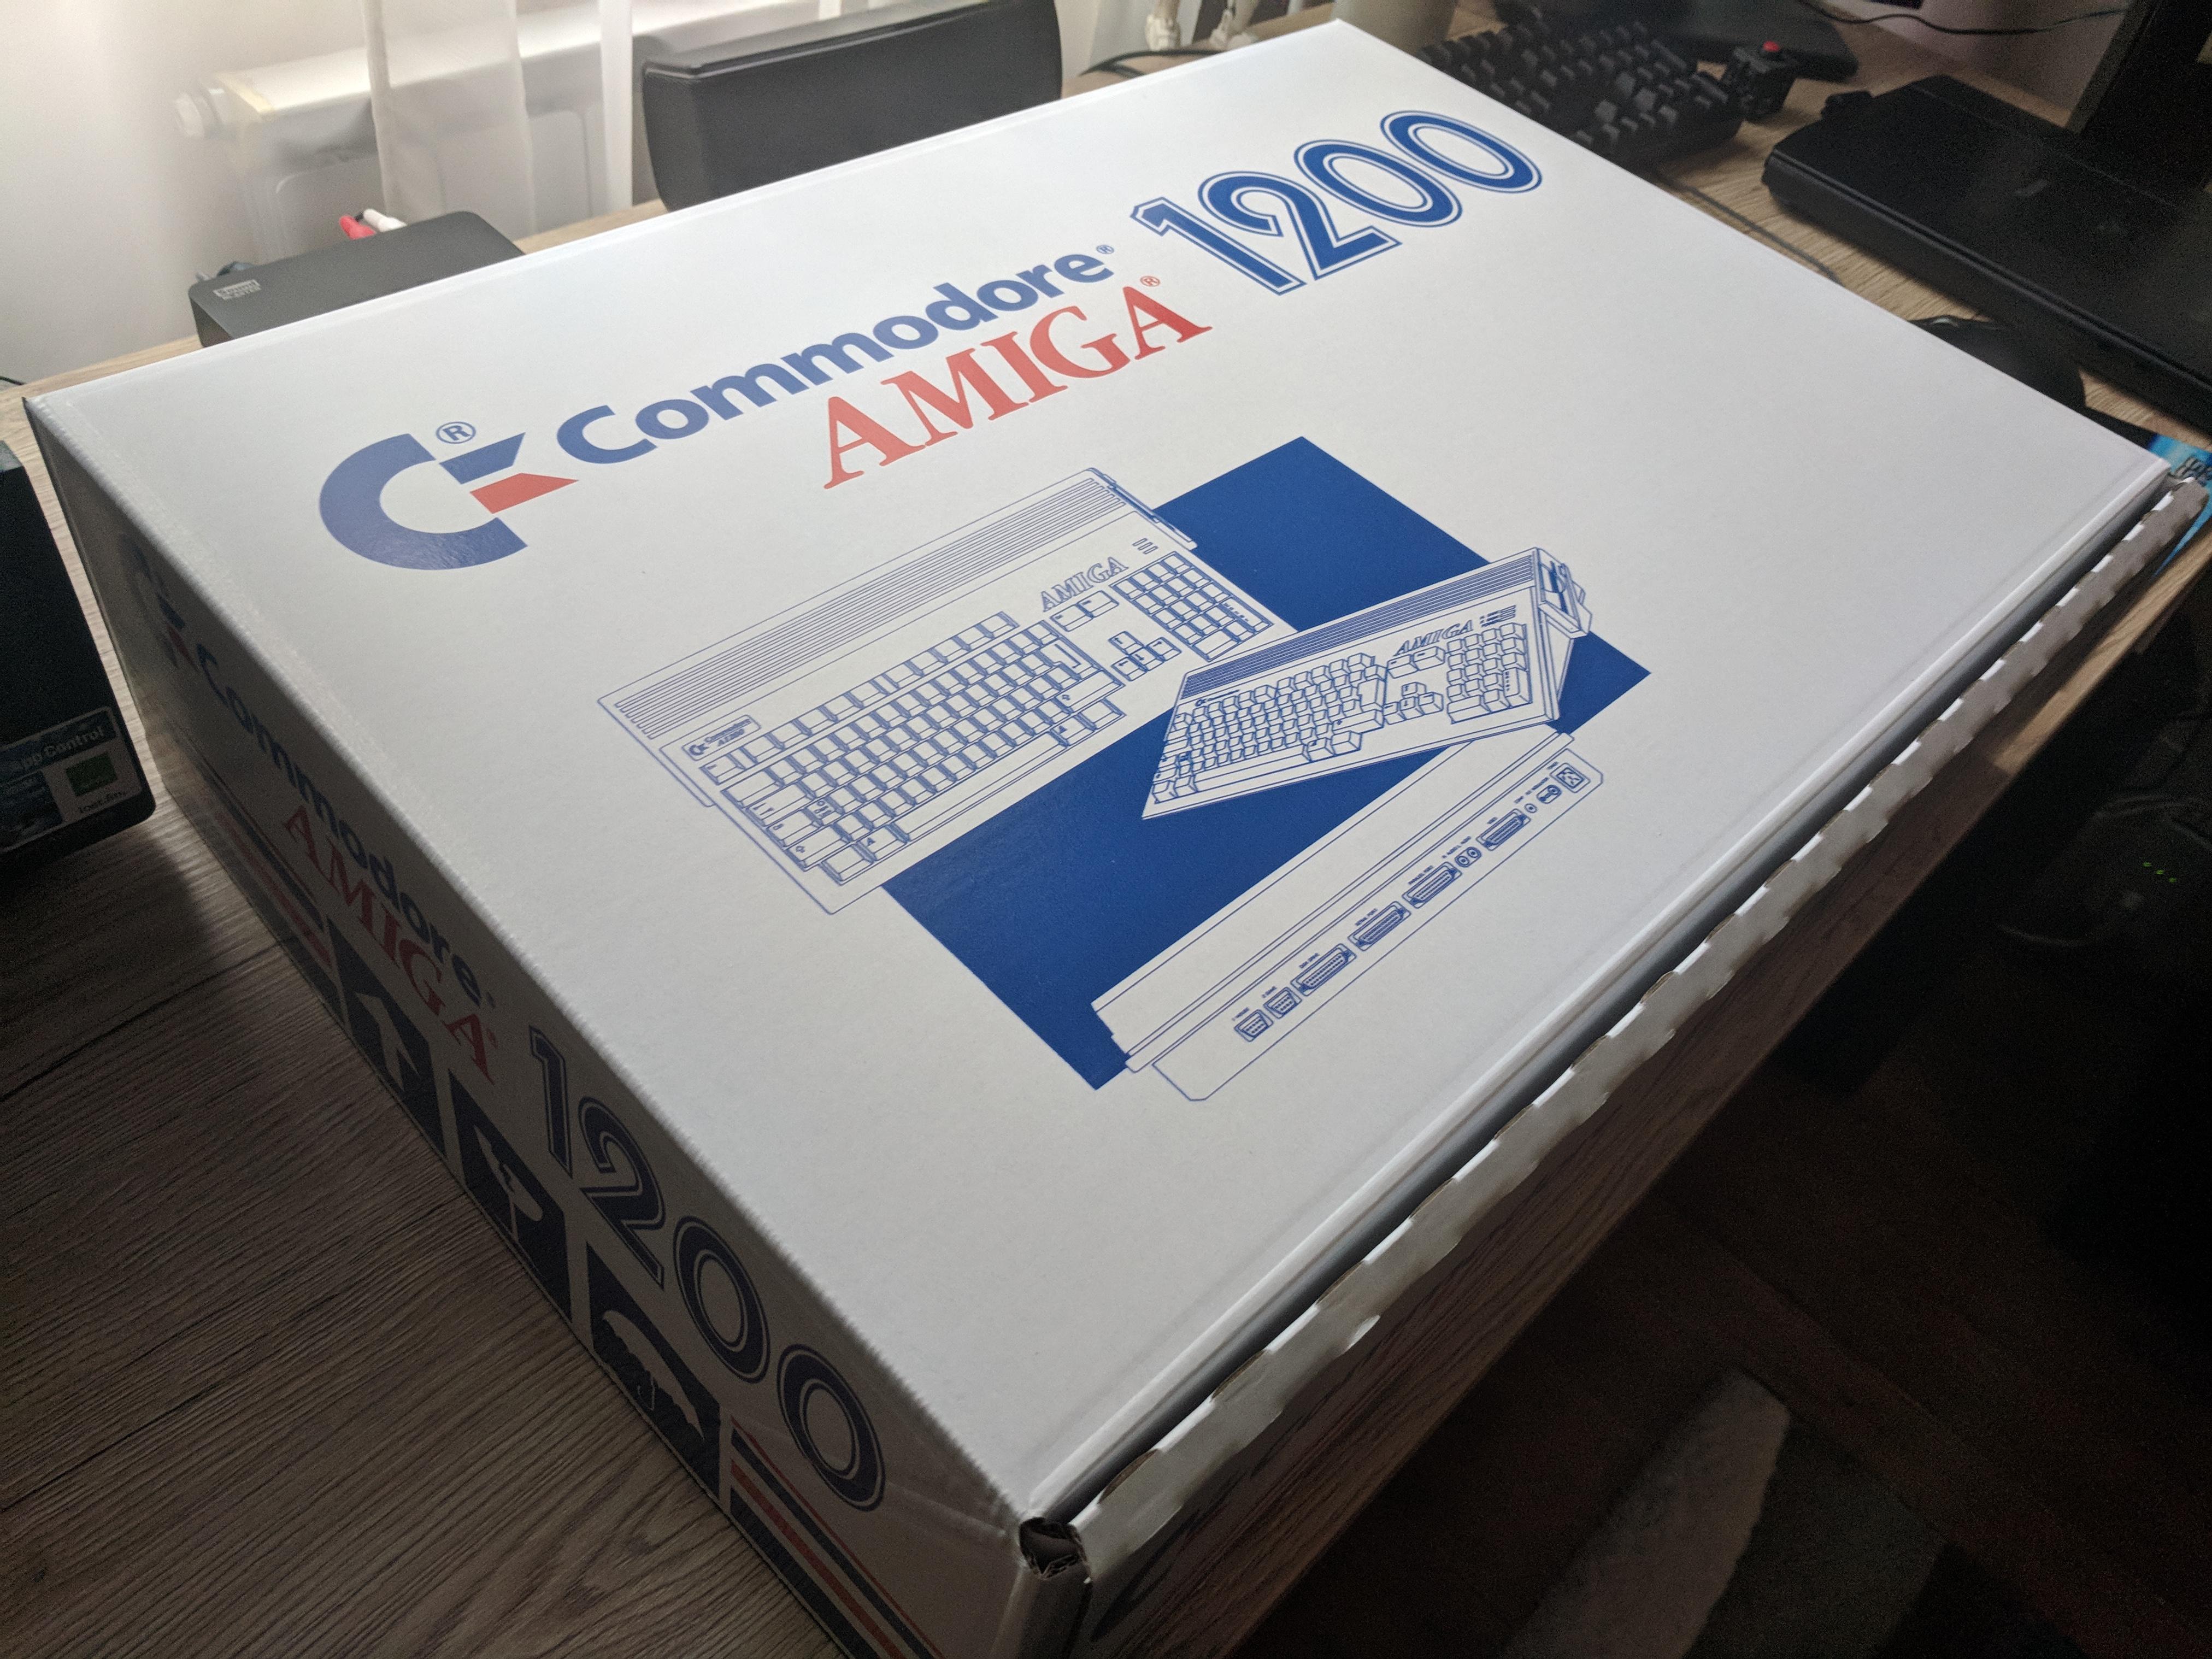 Amiga 1200: A spanyol barátnő